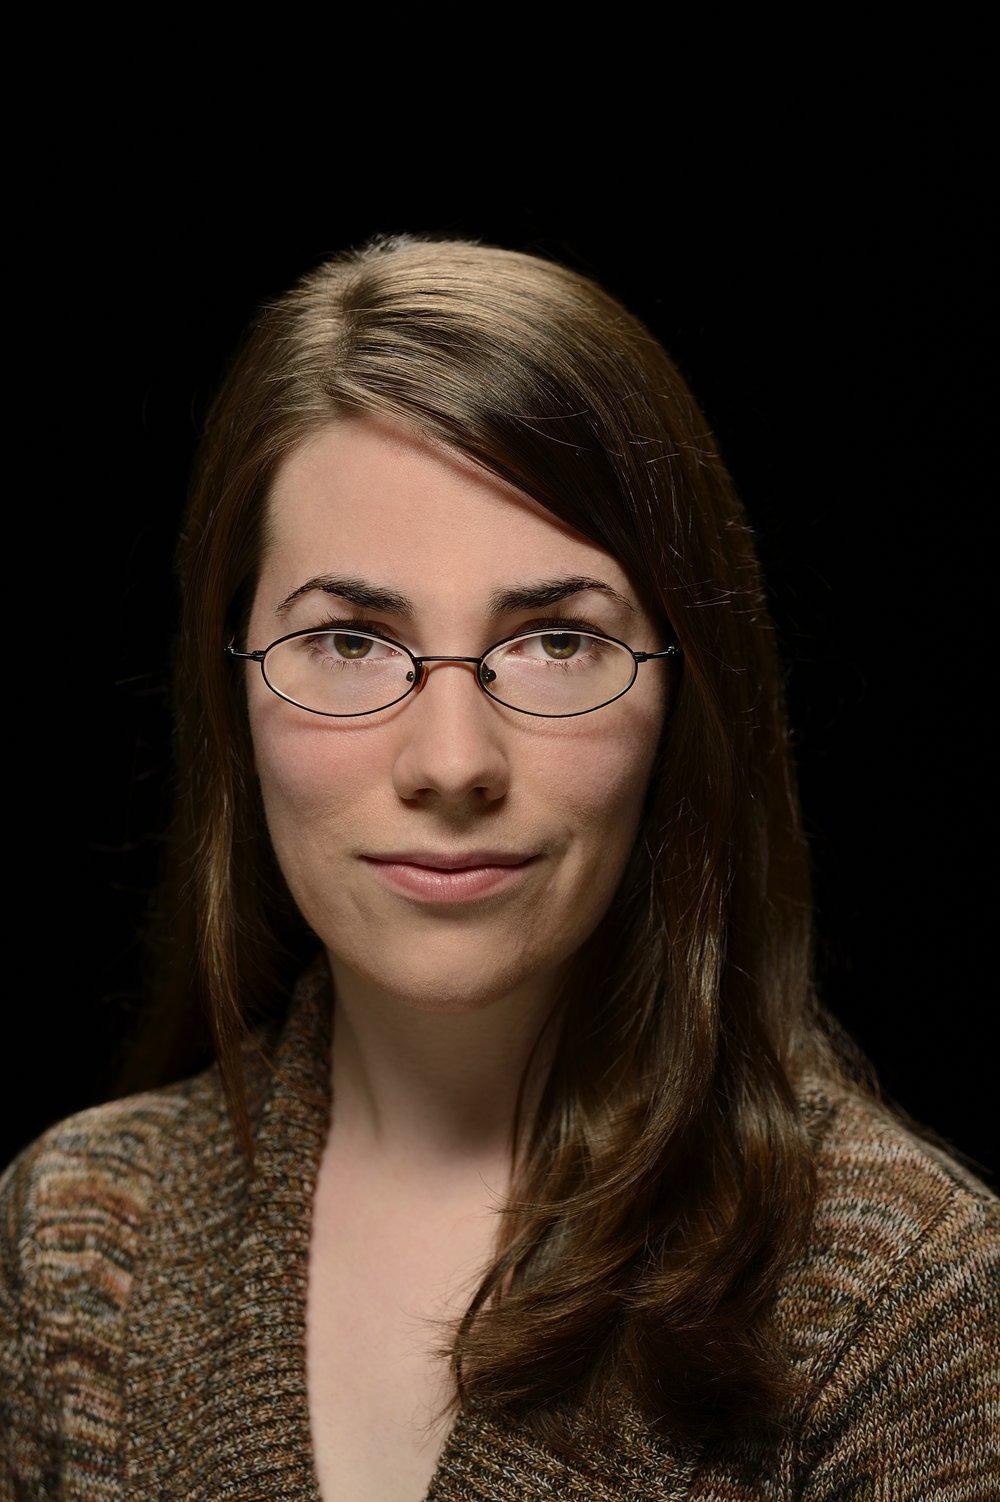 Natalie Draper 2013 Headshot.jpg